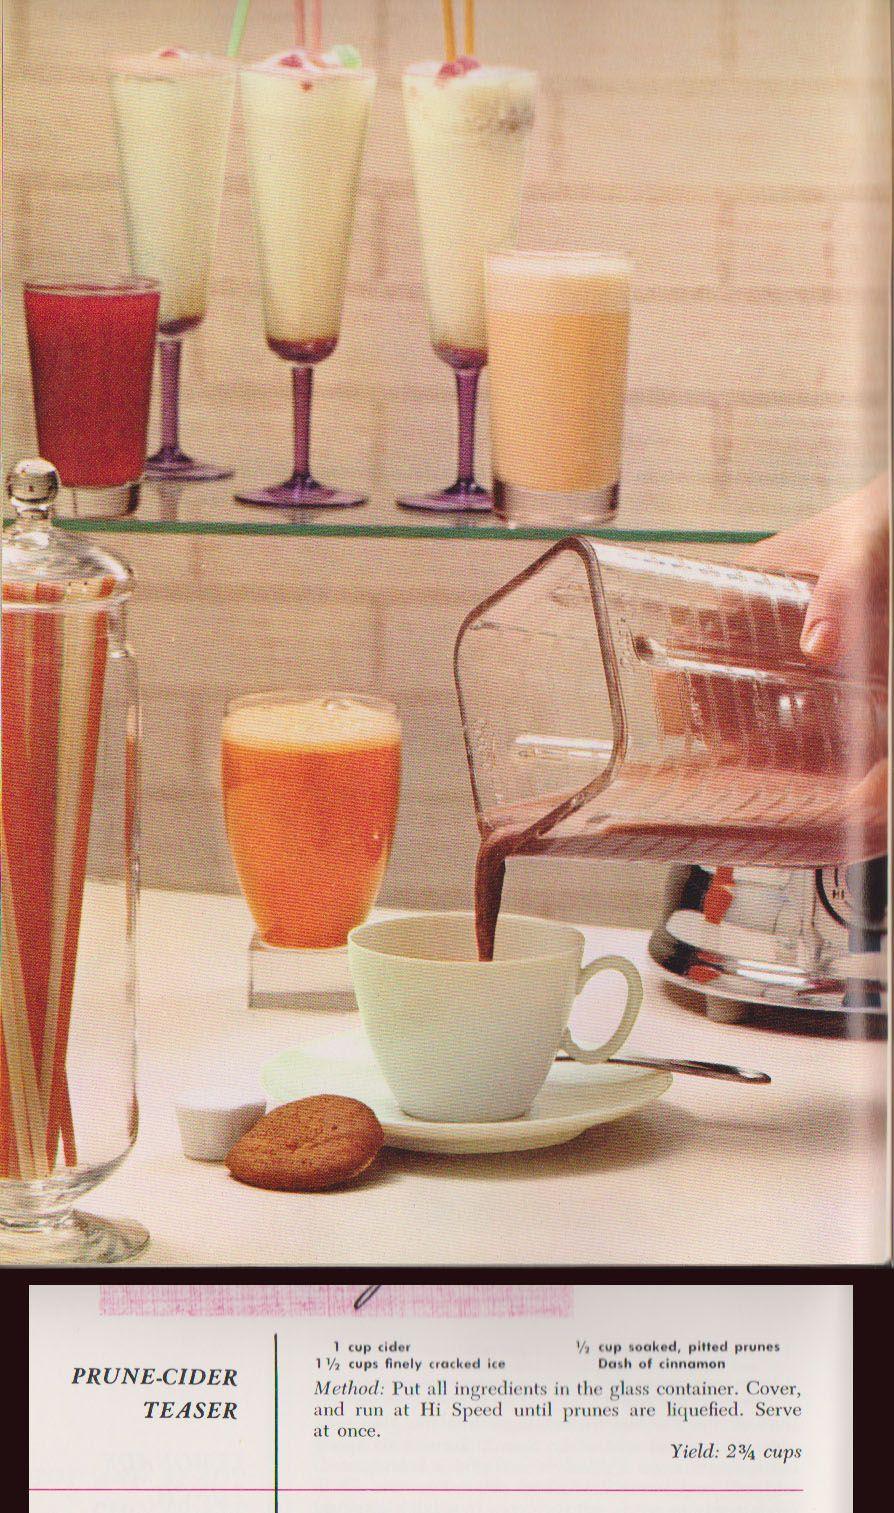 mmm... pruney - Osterizer 1963